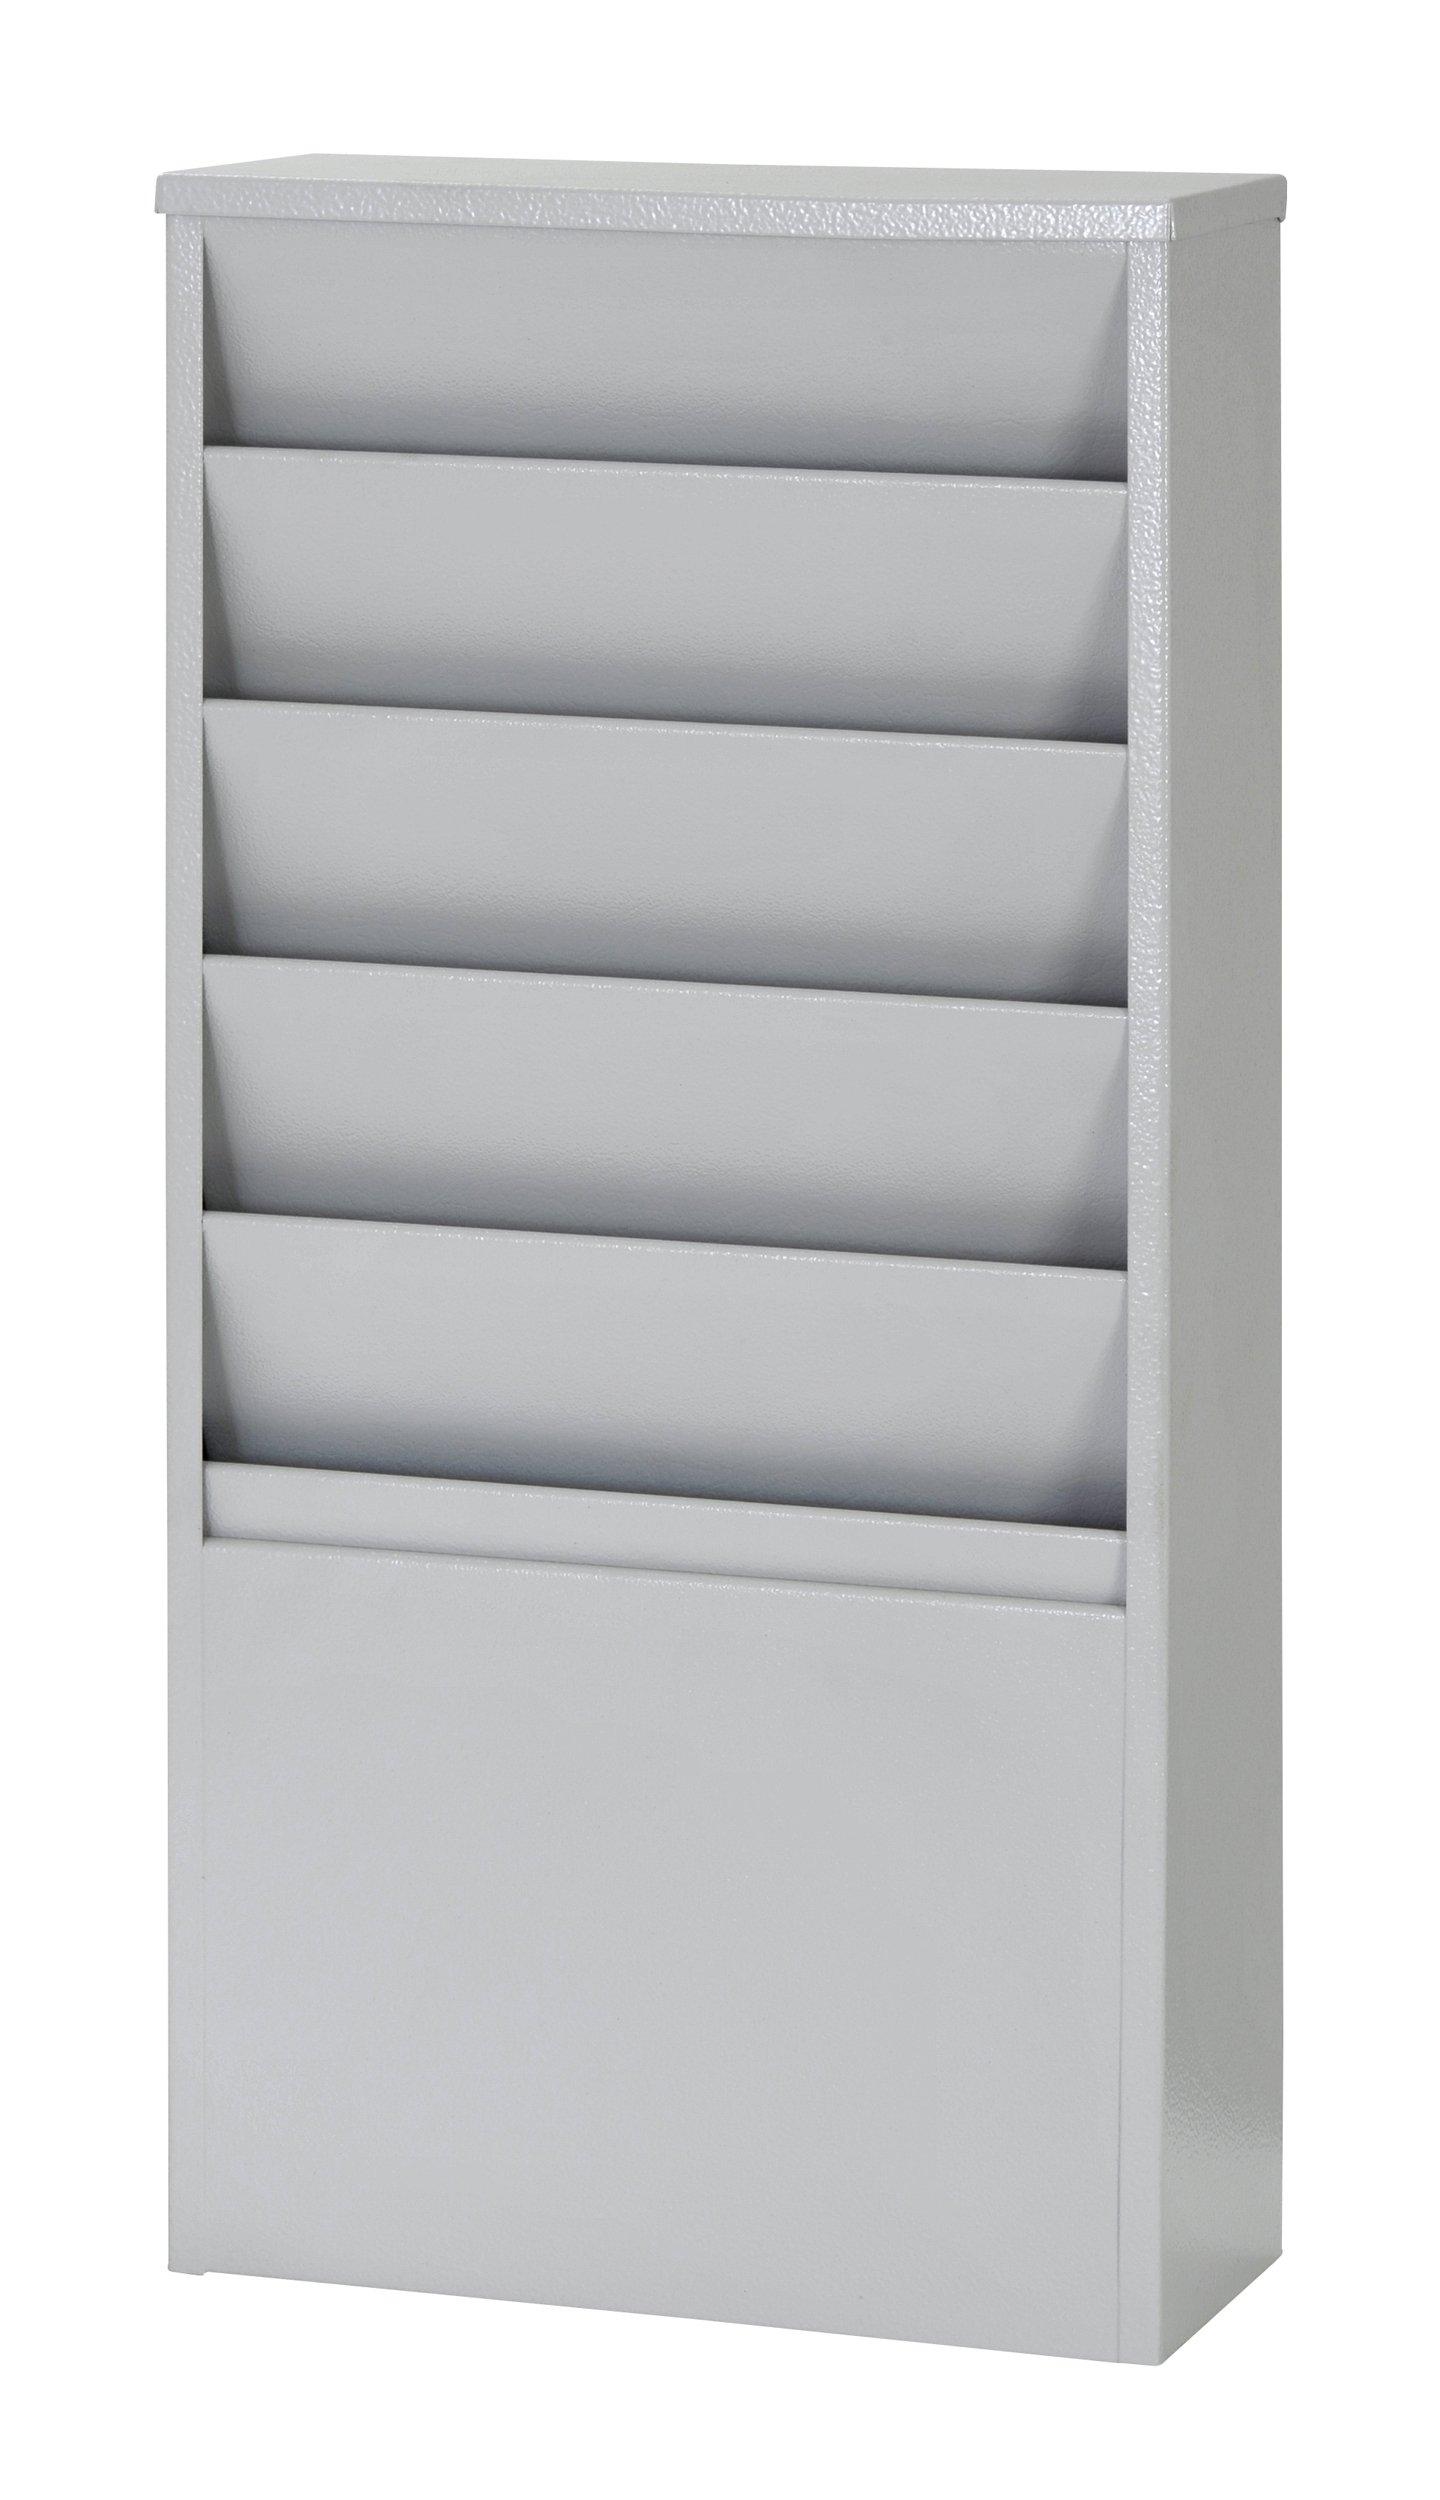 Buddy Products 5-Pocket Display Rack, Steel, 4 x 20.38 x 9.75 Inches, Platinum (0811-32)